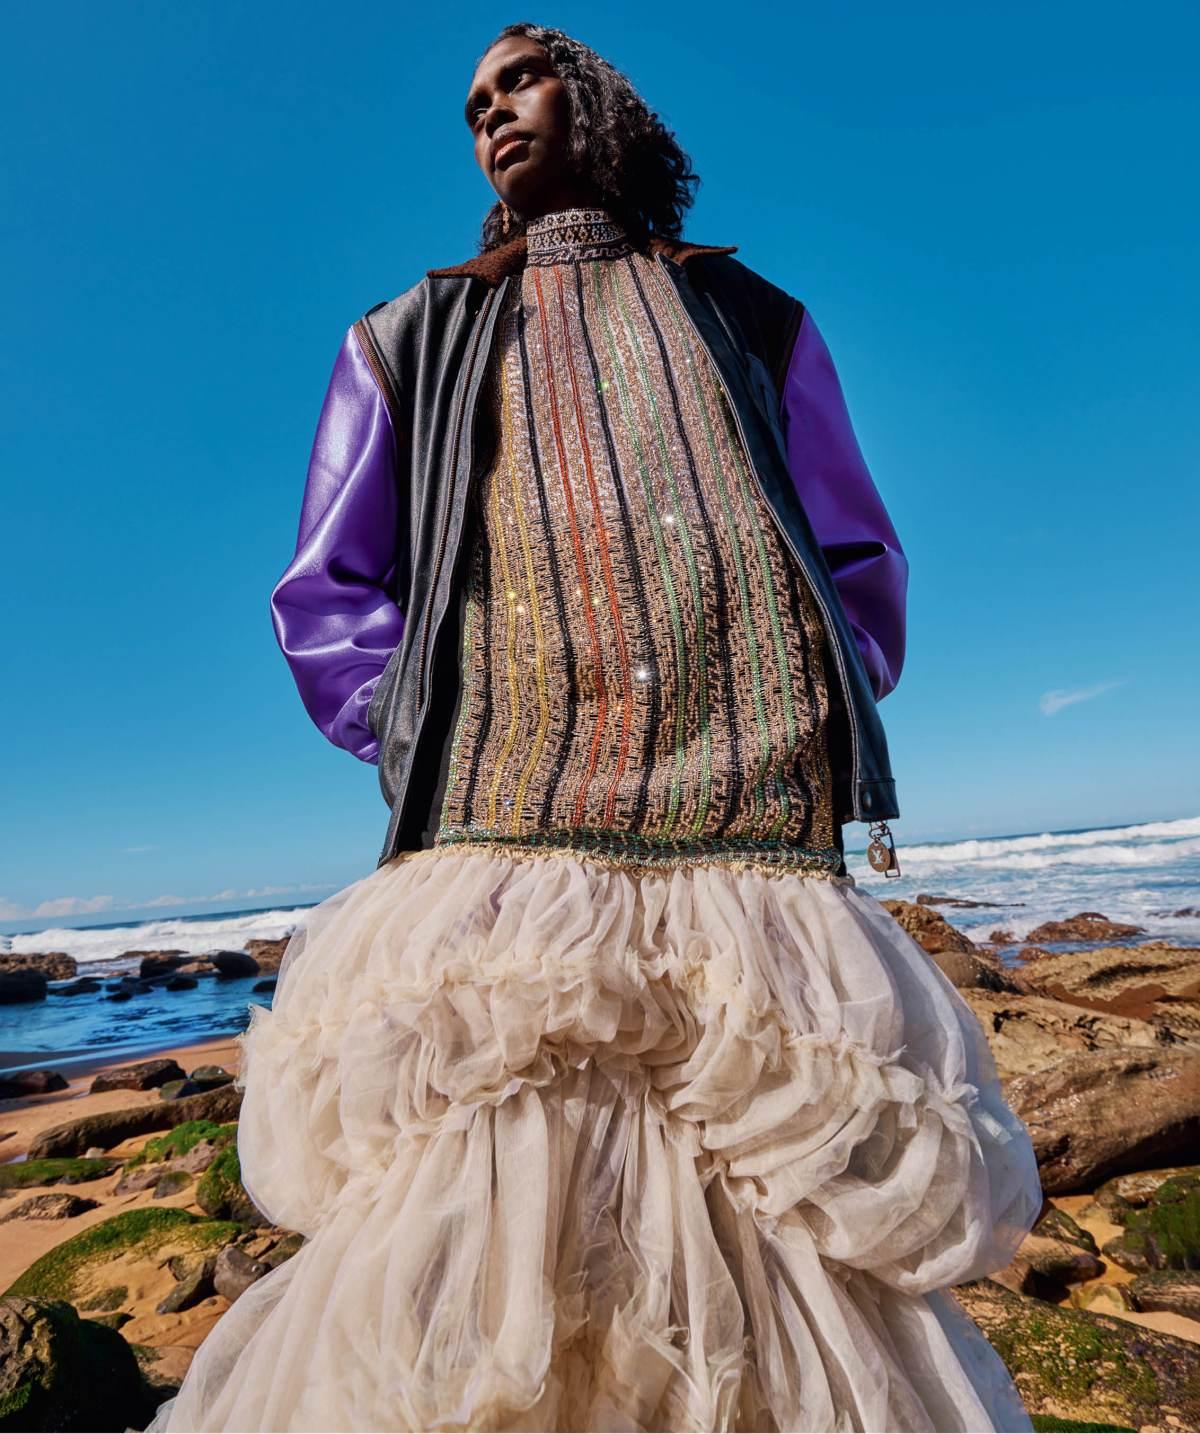 Magnolia Maymuru covers Vogue Australia September 2021 by Charles Dennington